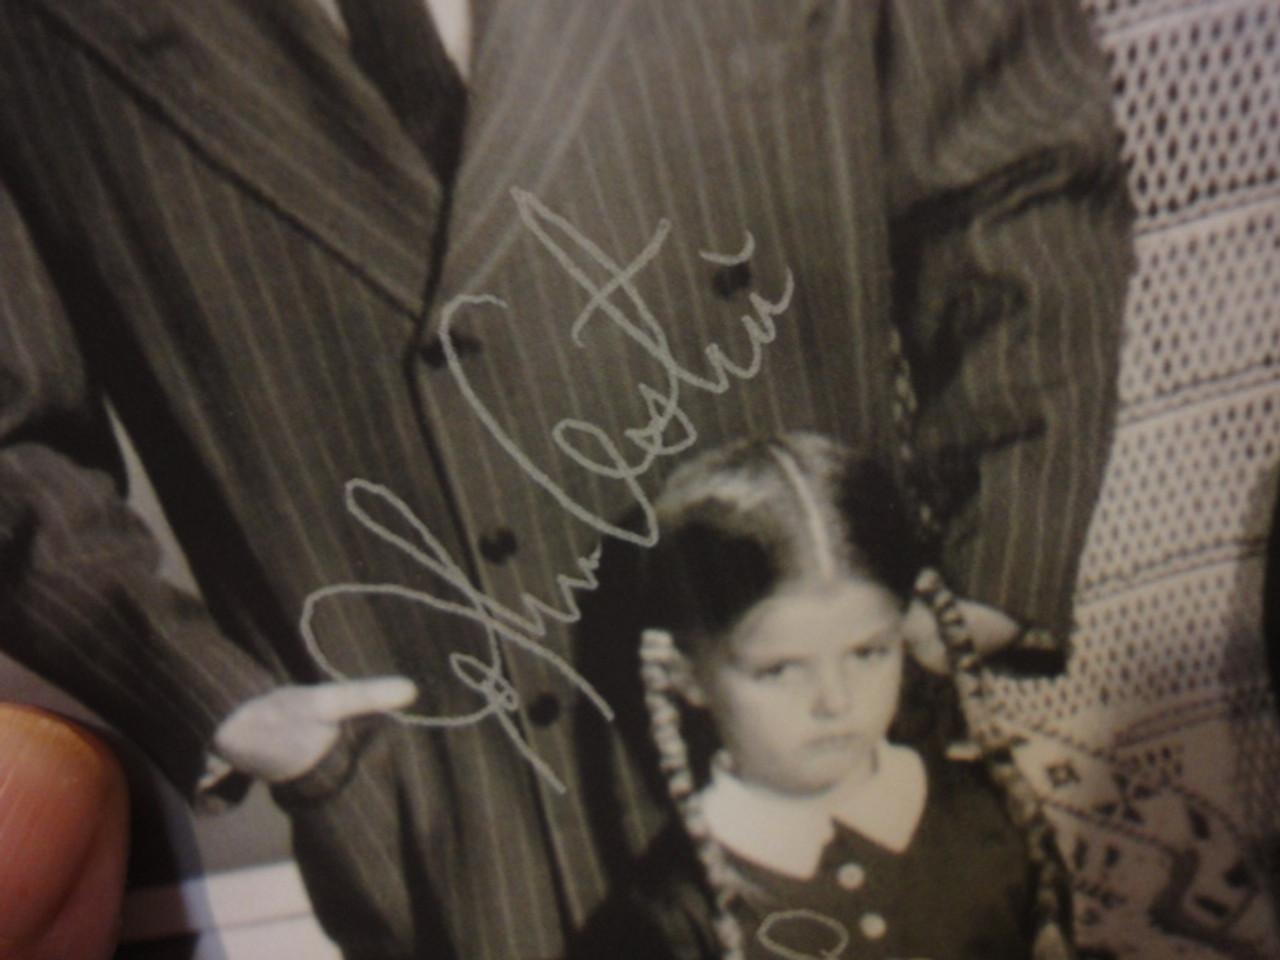 Addams Family Photo Signed Autograph John Astin Lisa Loring Felix Silla